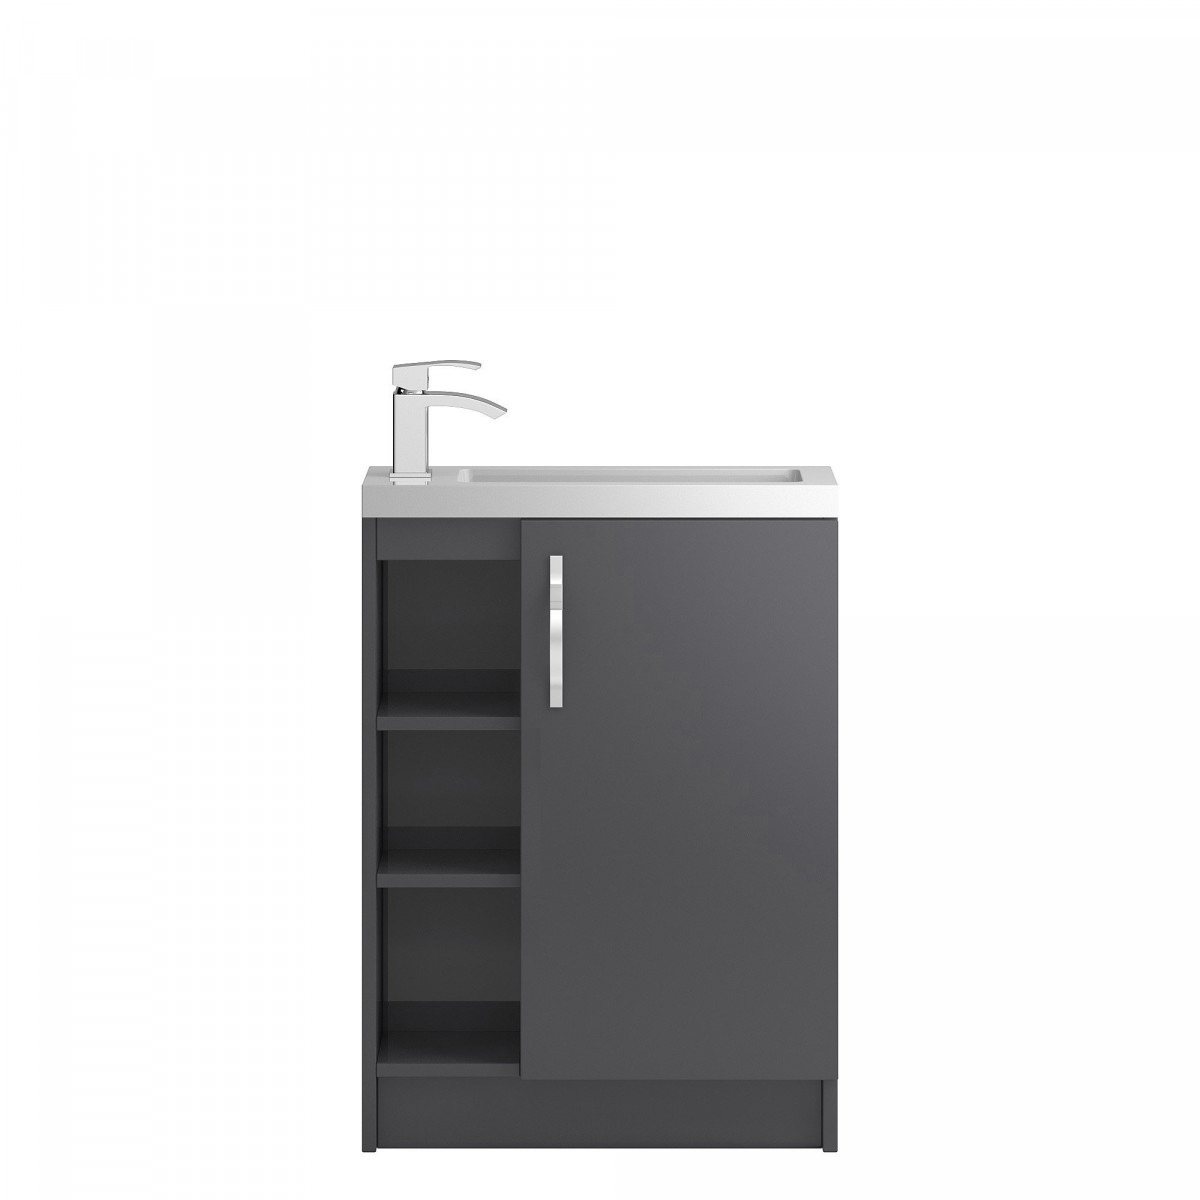 Hudson Reed Apollo Compact Open Shelf Floorstanding 600mm